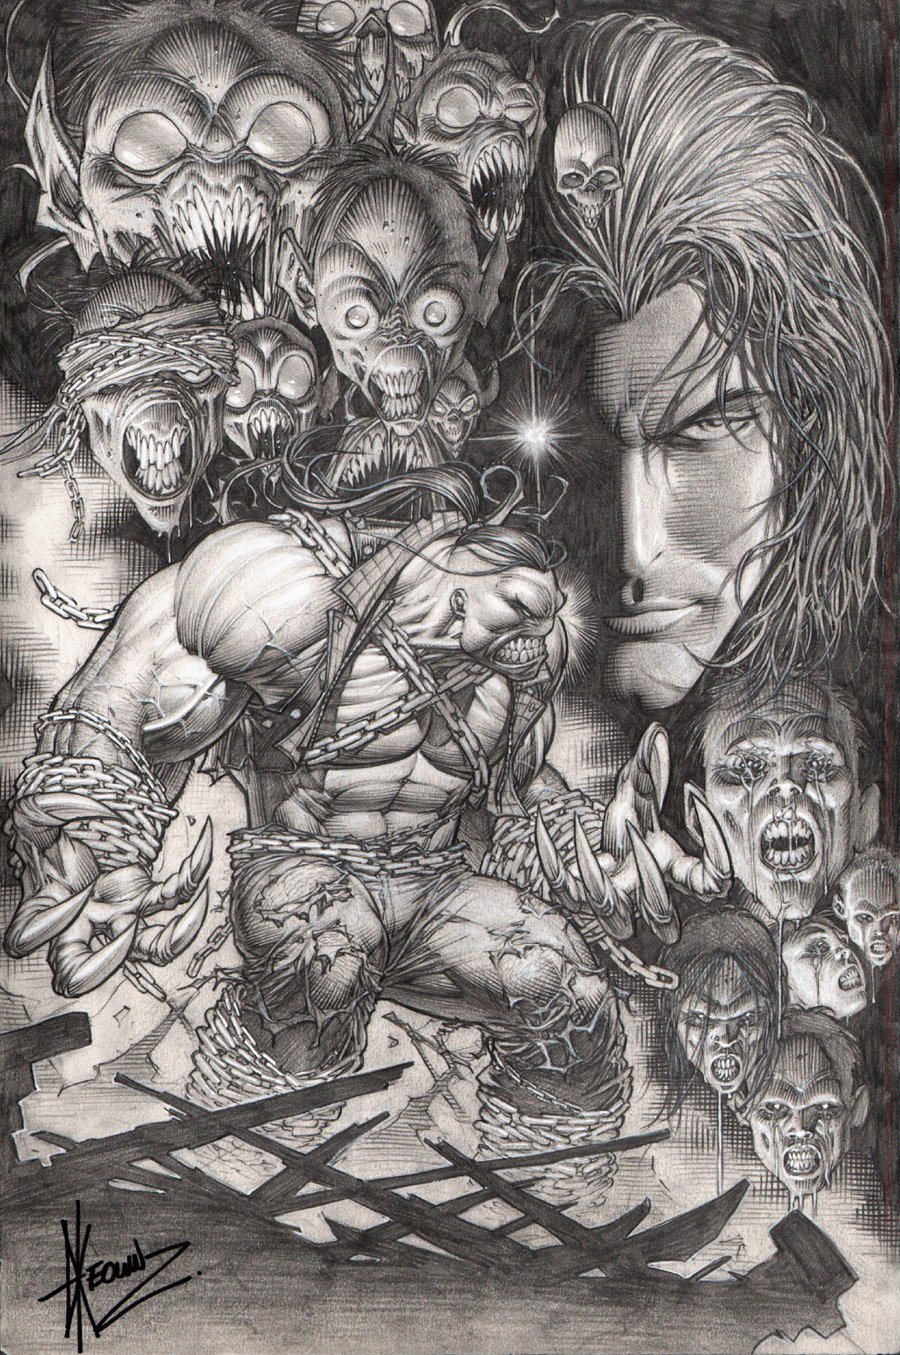 Darkness / Pitt #1 Cover (2009)